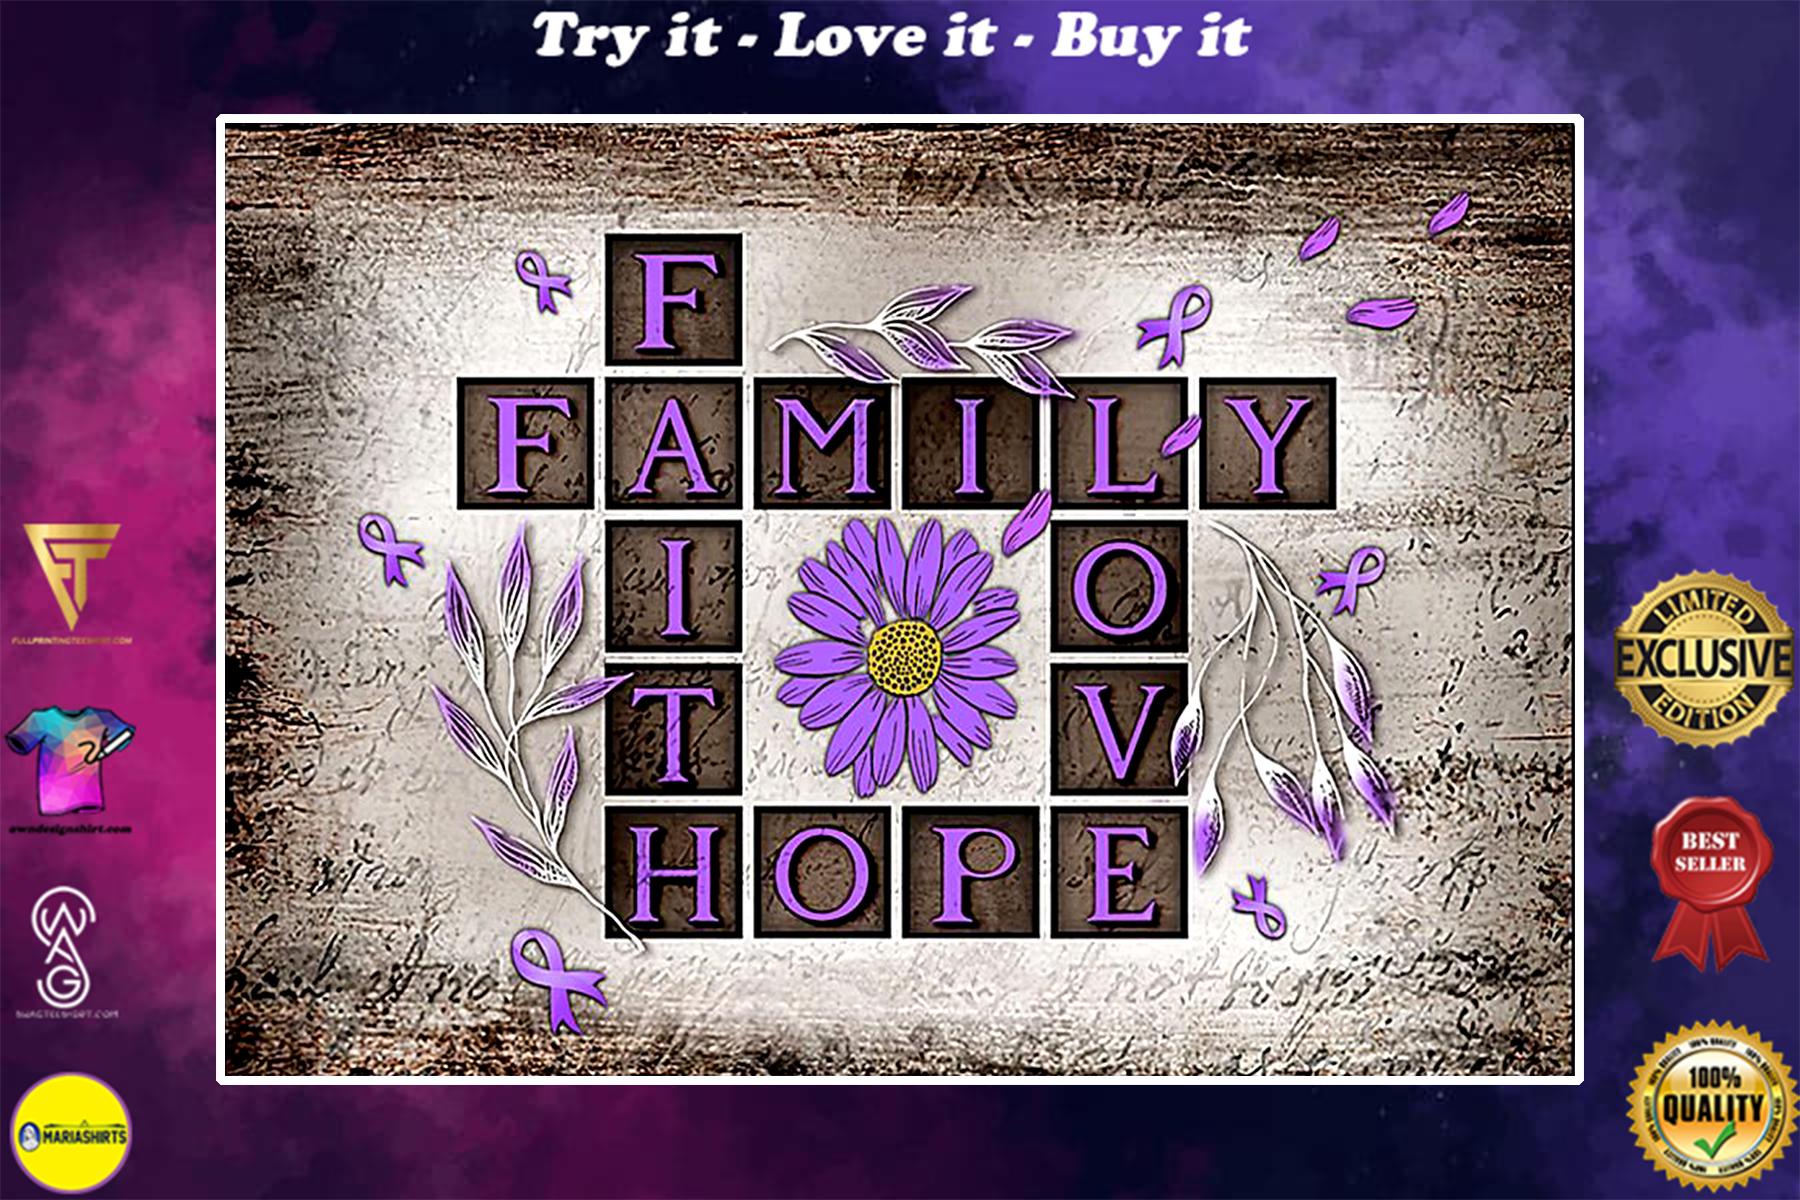 faith hope love family alzheimers disease poster